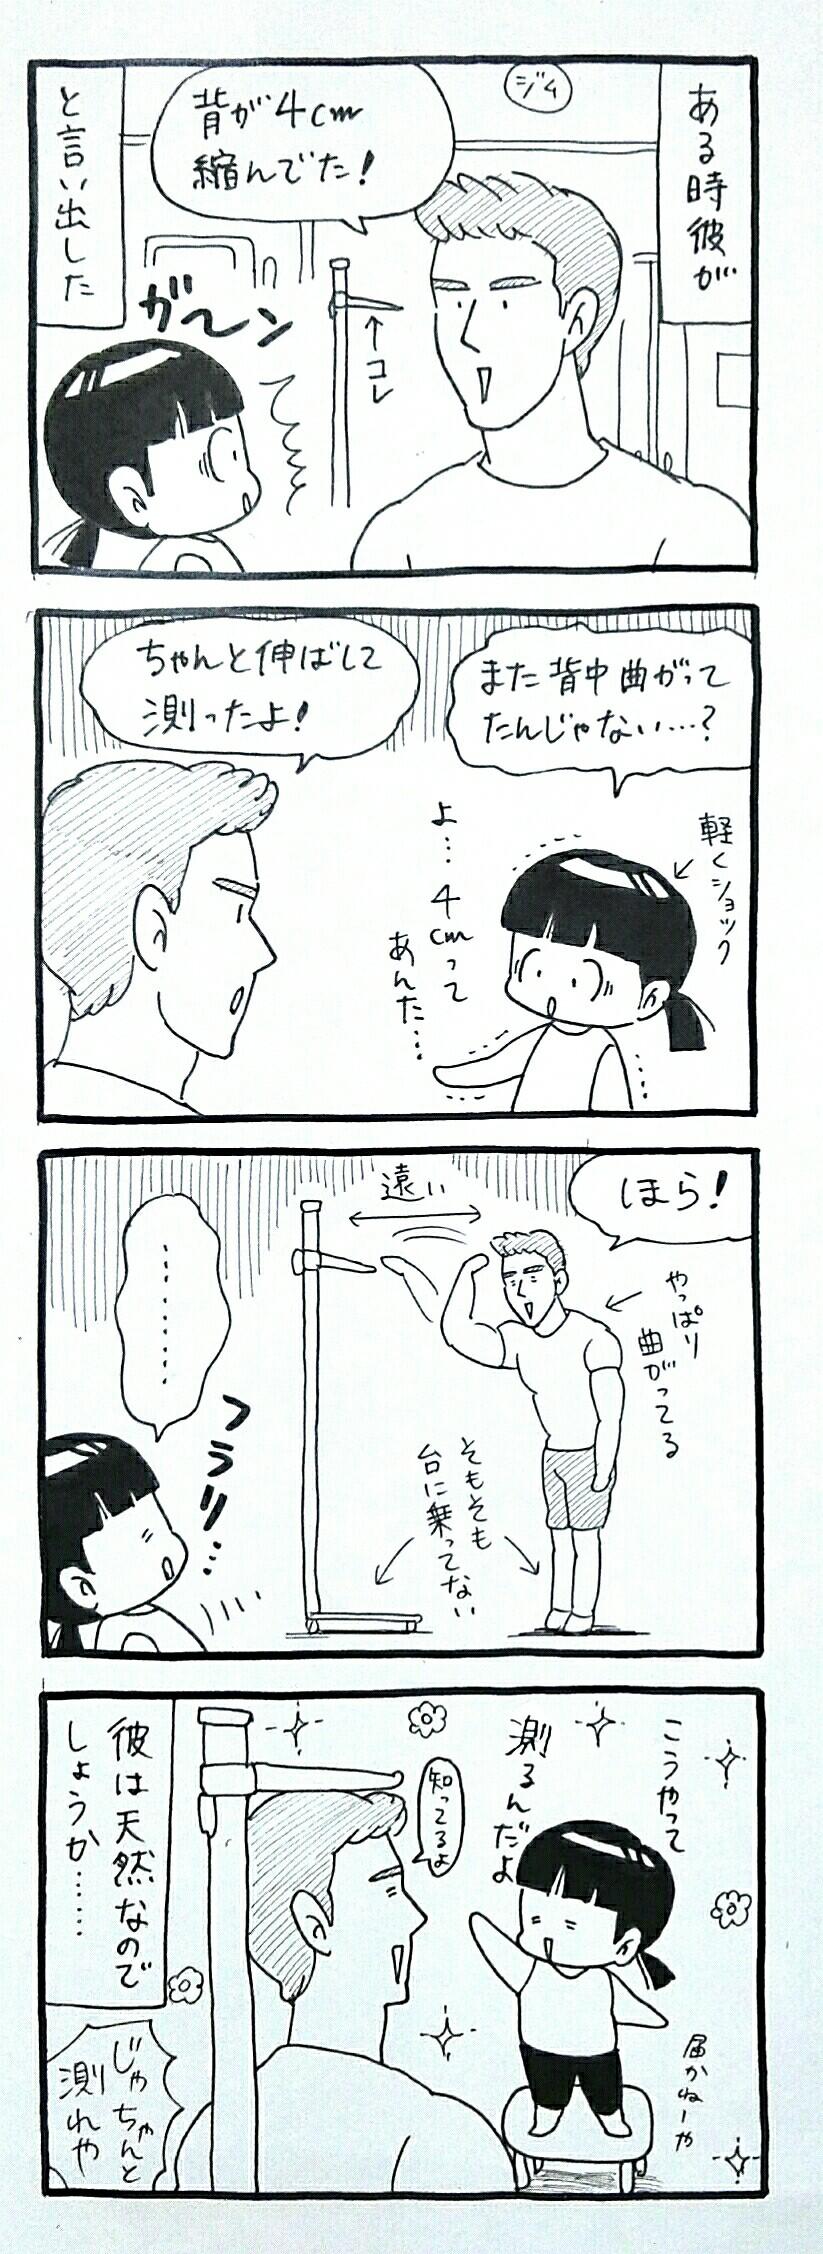 f:id:Shoko_drawing:20190616222927j:plain